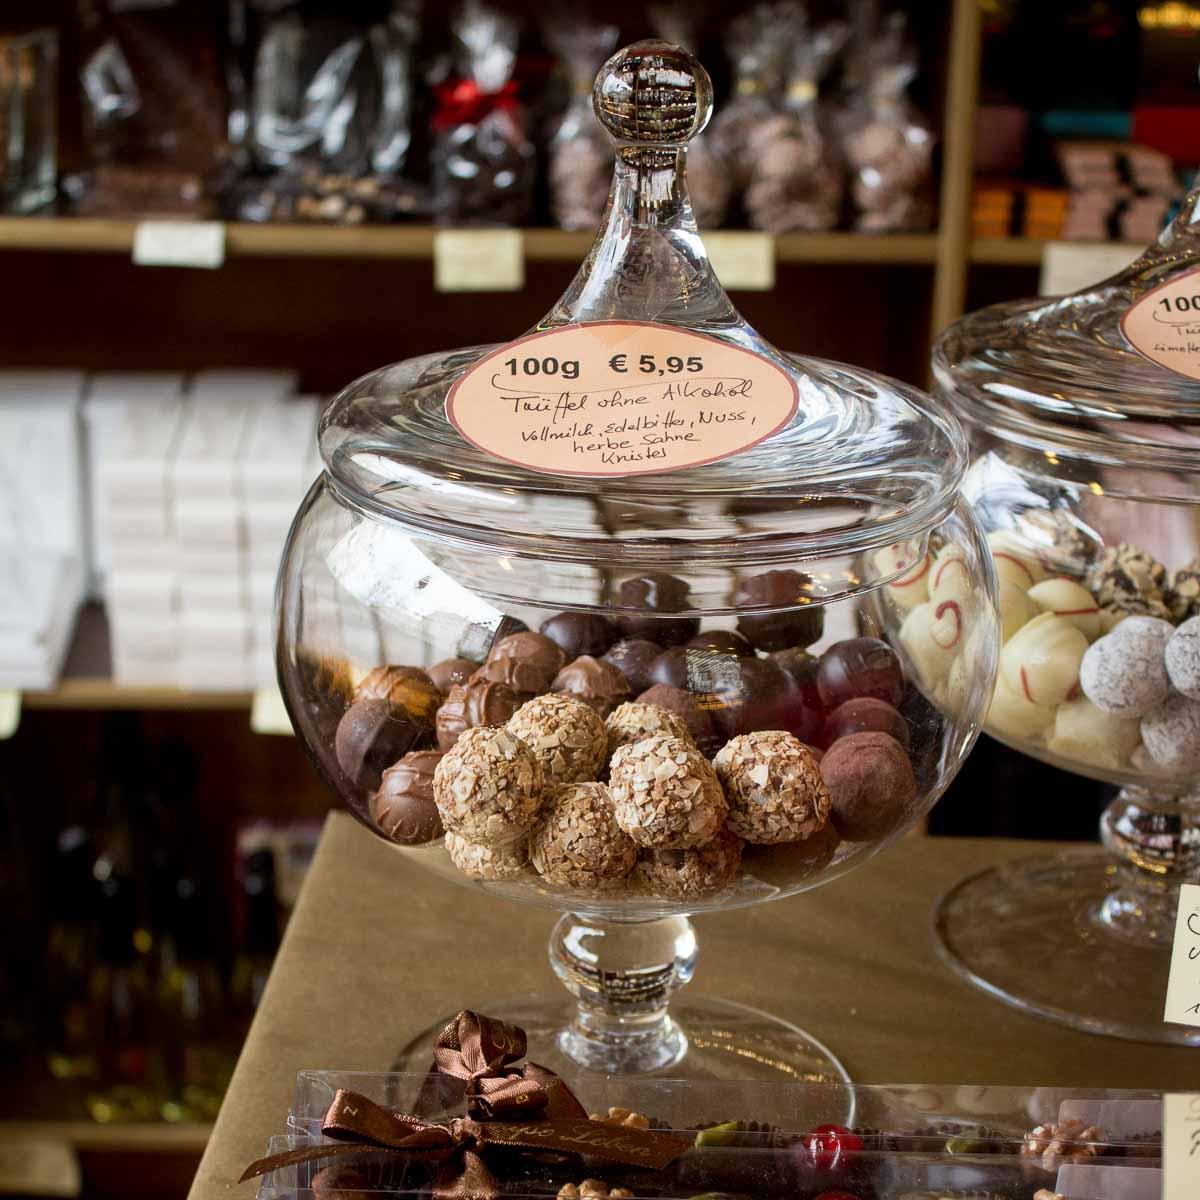 Das süße Leben Schokoladen & Pralinen in Berlin-Schöneberg-2